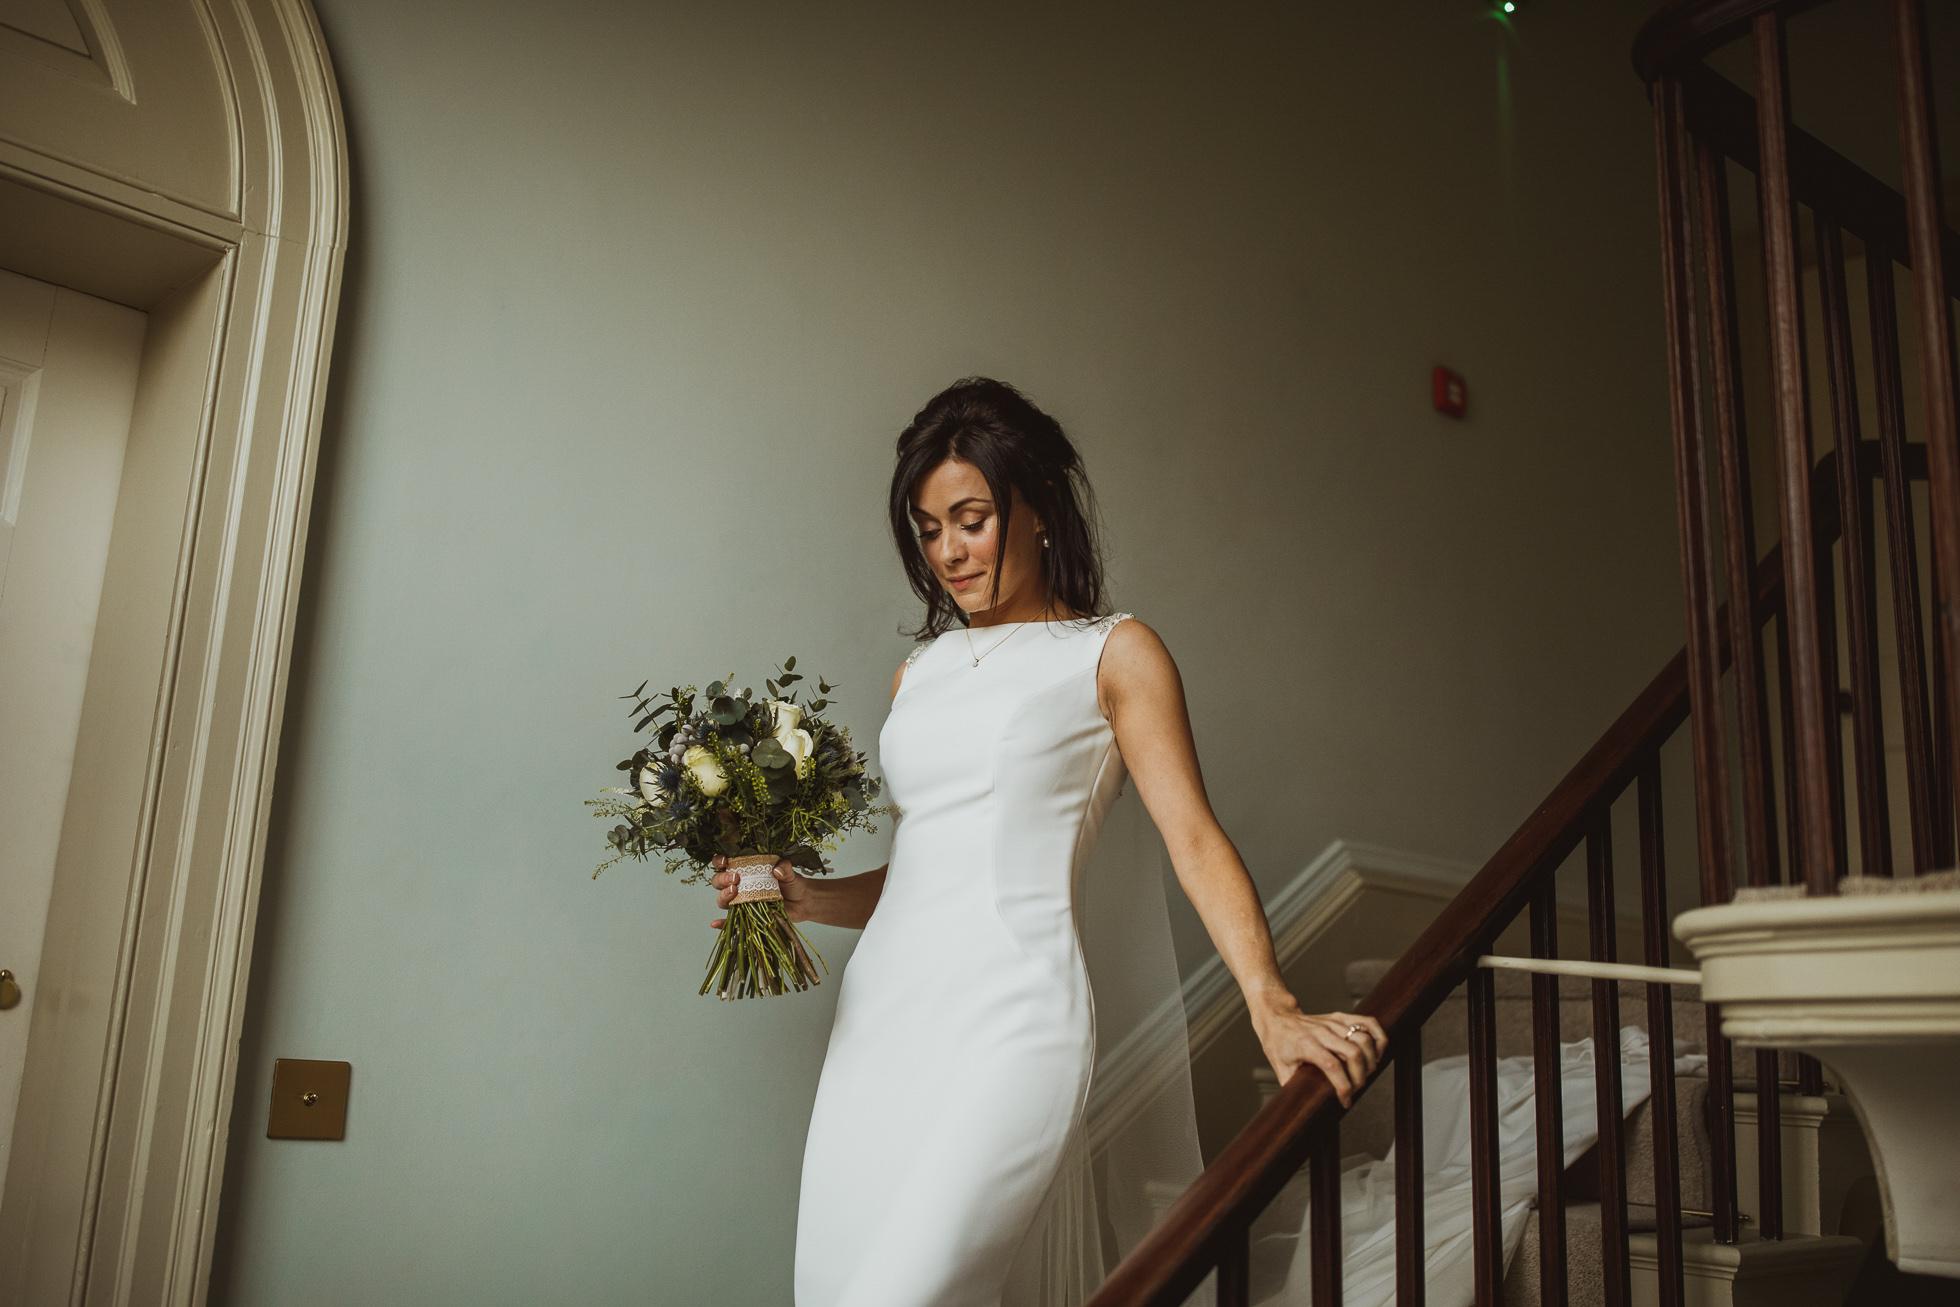 hornington_manor_wedding_photographer-39.jpg